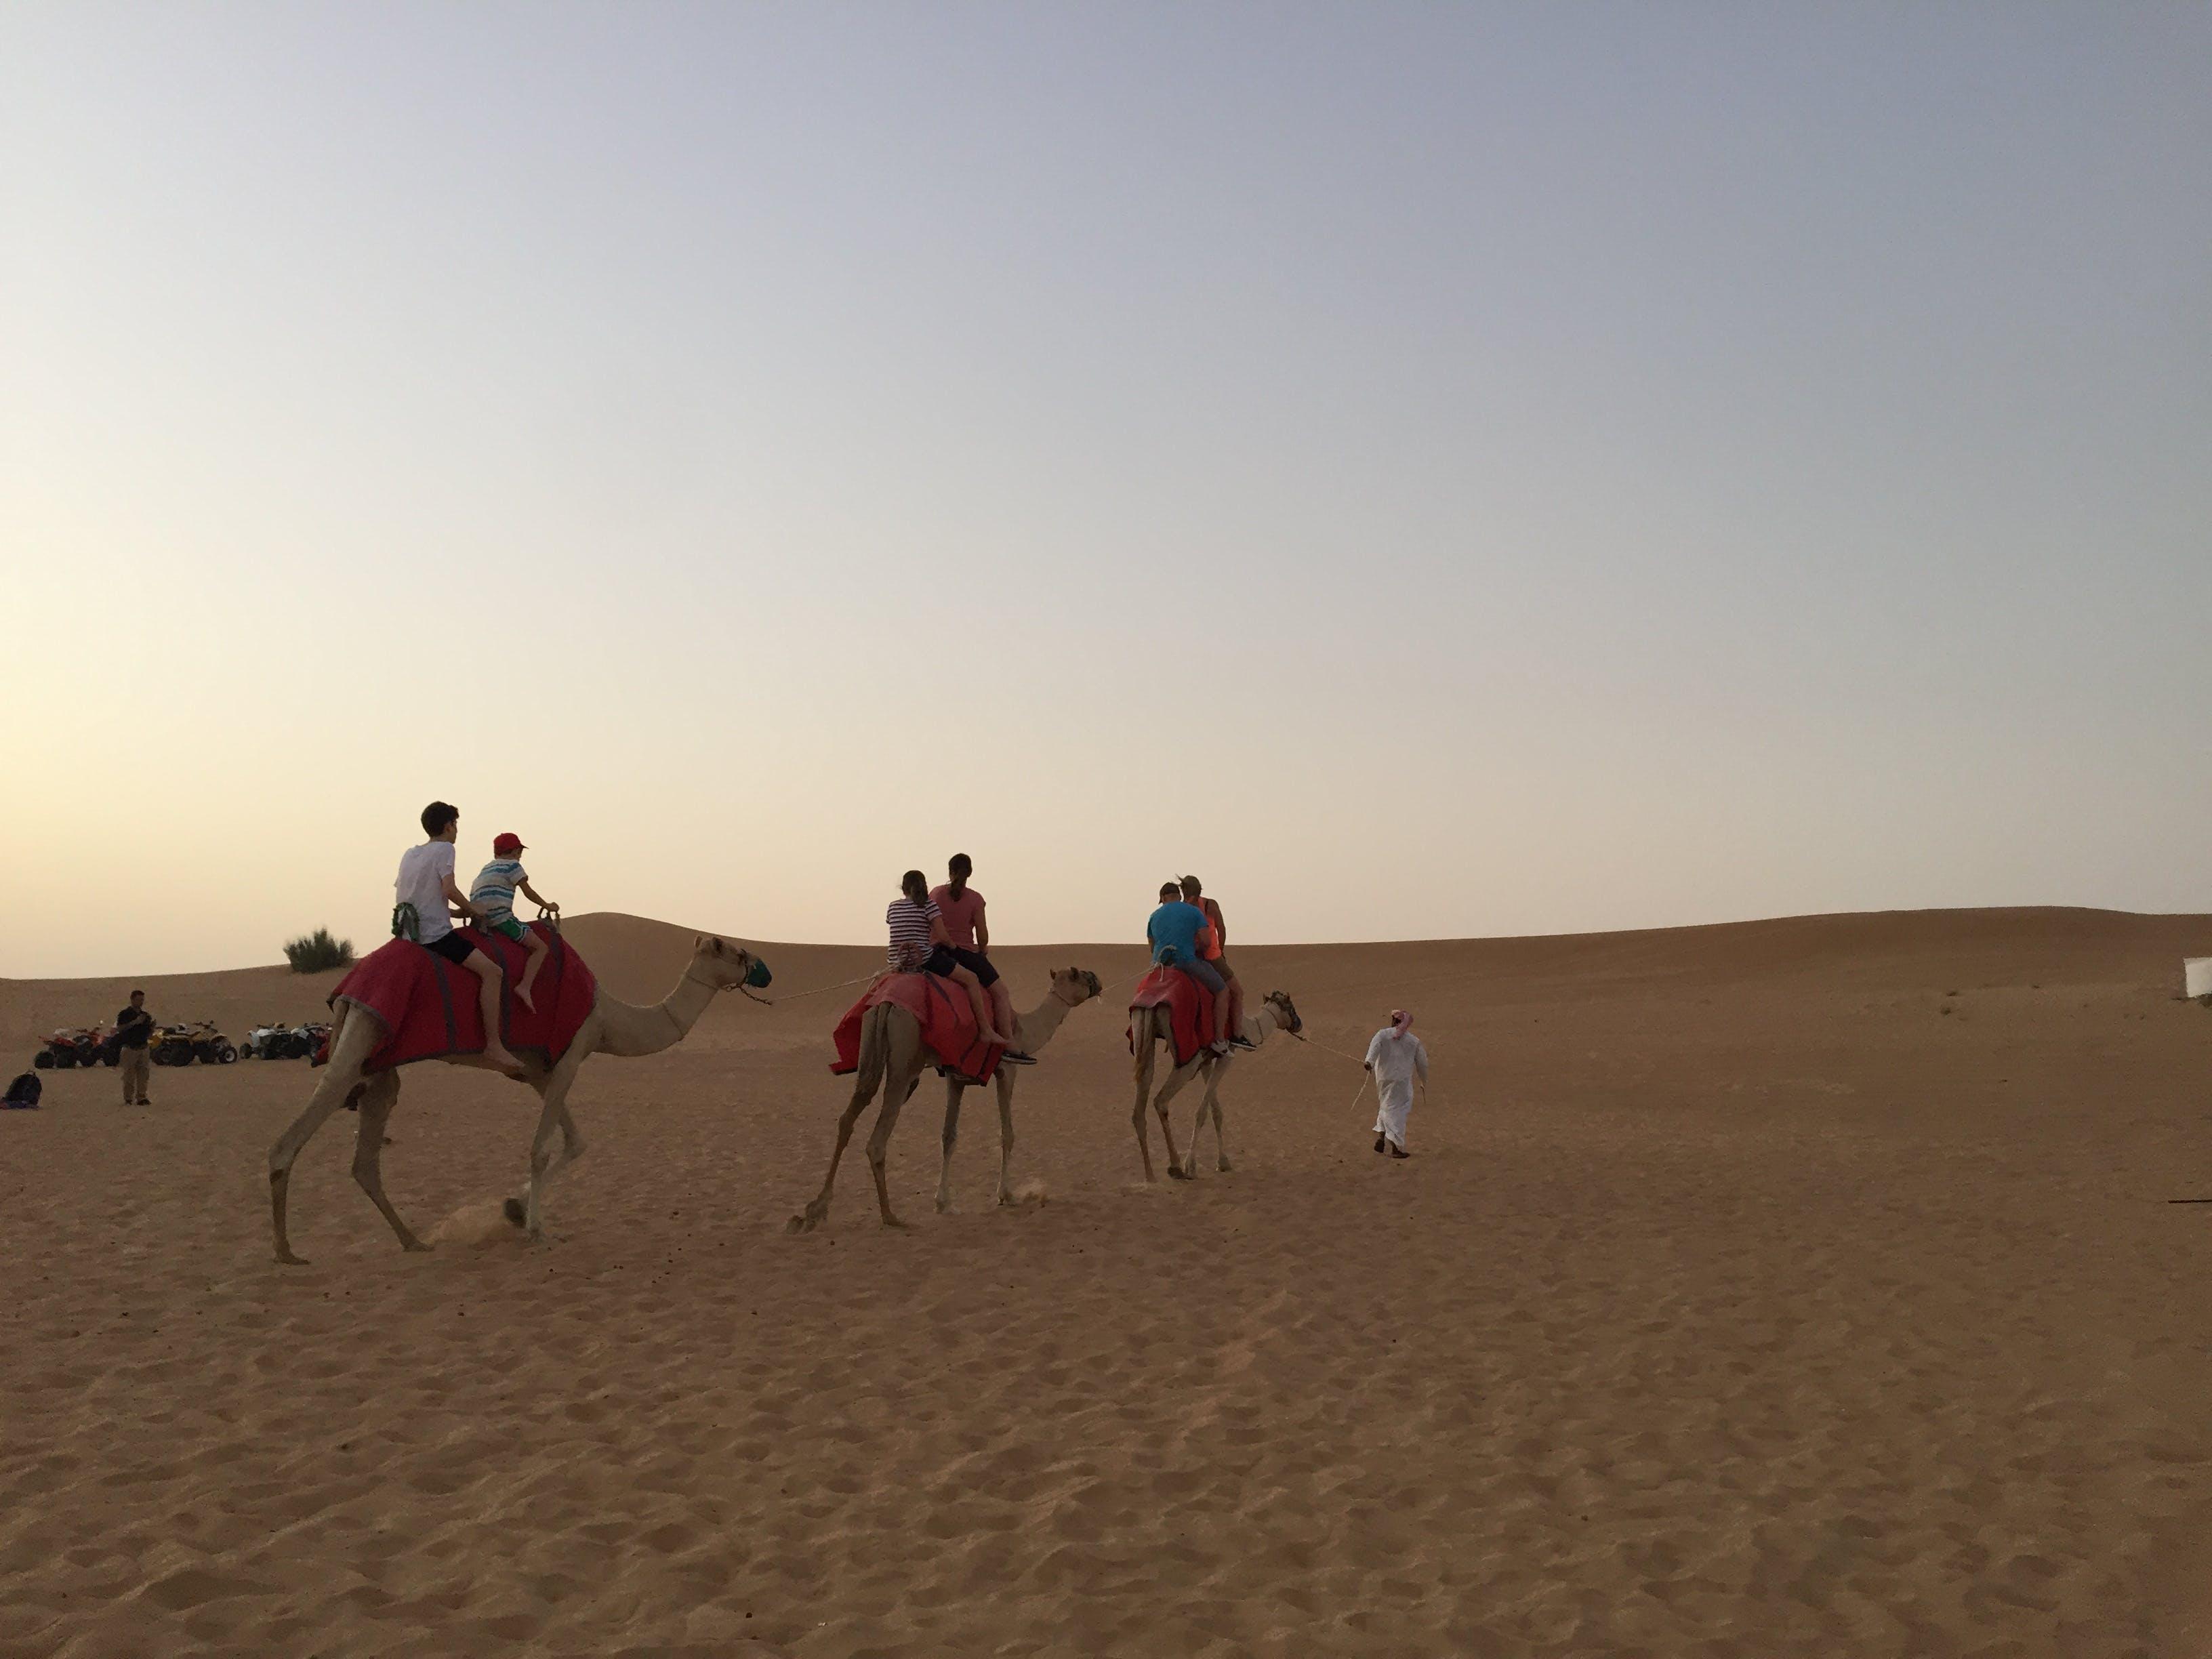 Free stock photo of Arabian camel, camel, desert, safari